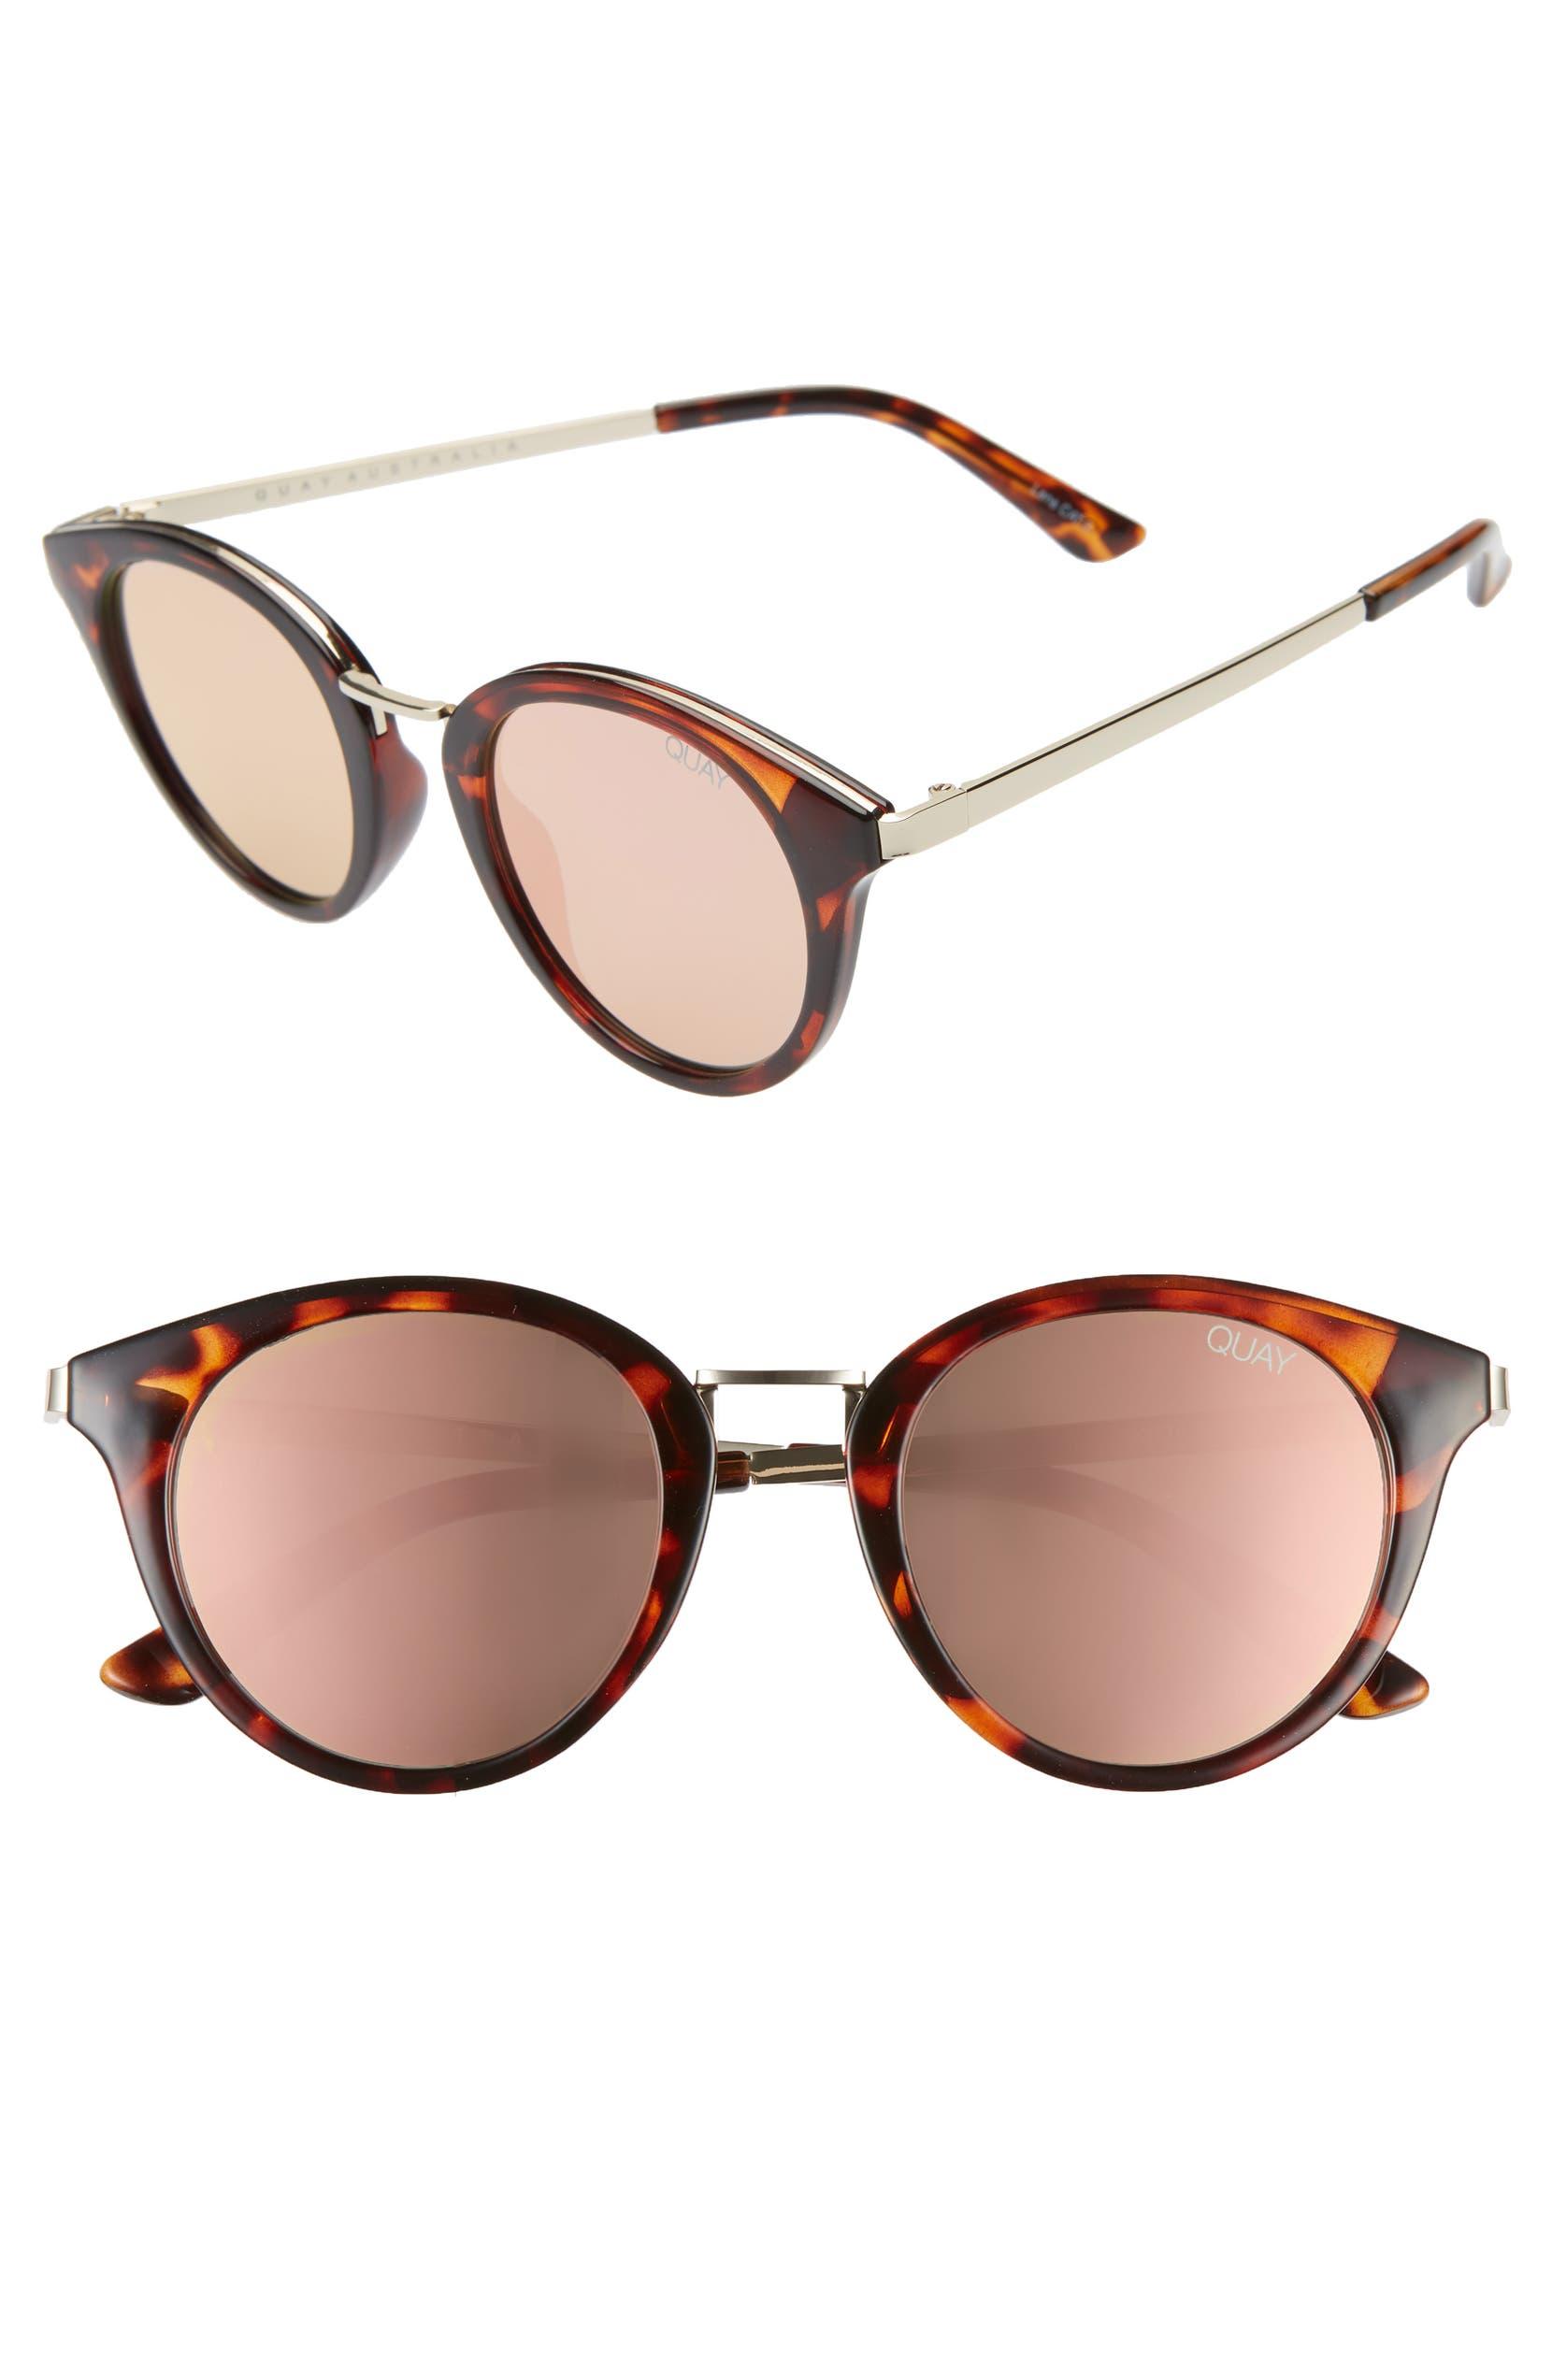 719c63d67674 Quay Australia Gotta Run 48mm Sunglasses   Nordstrom